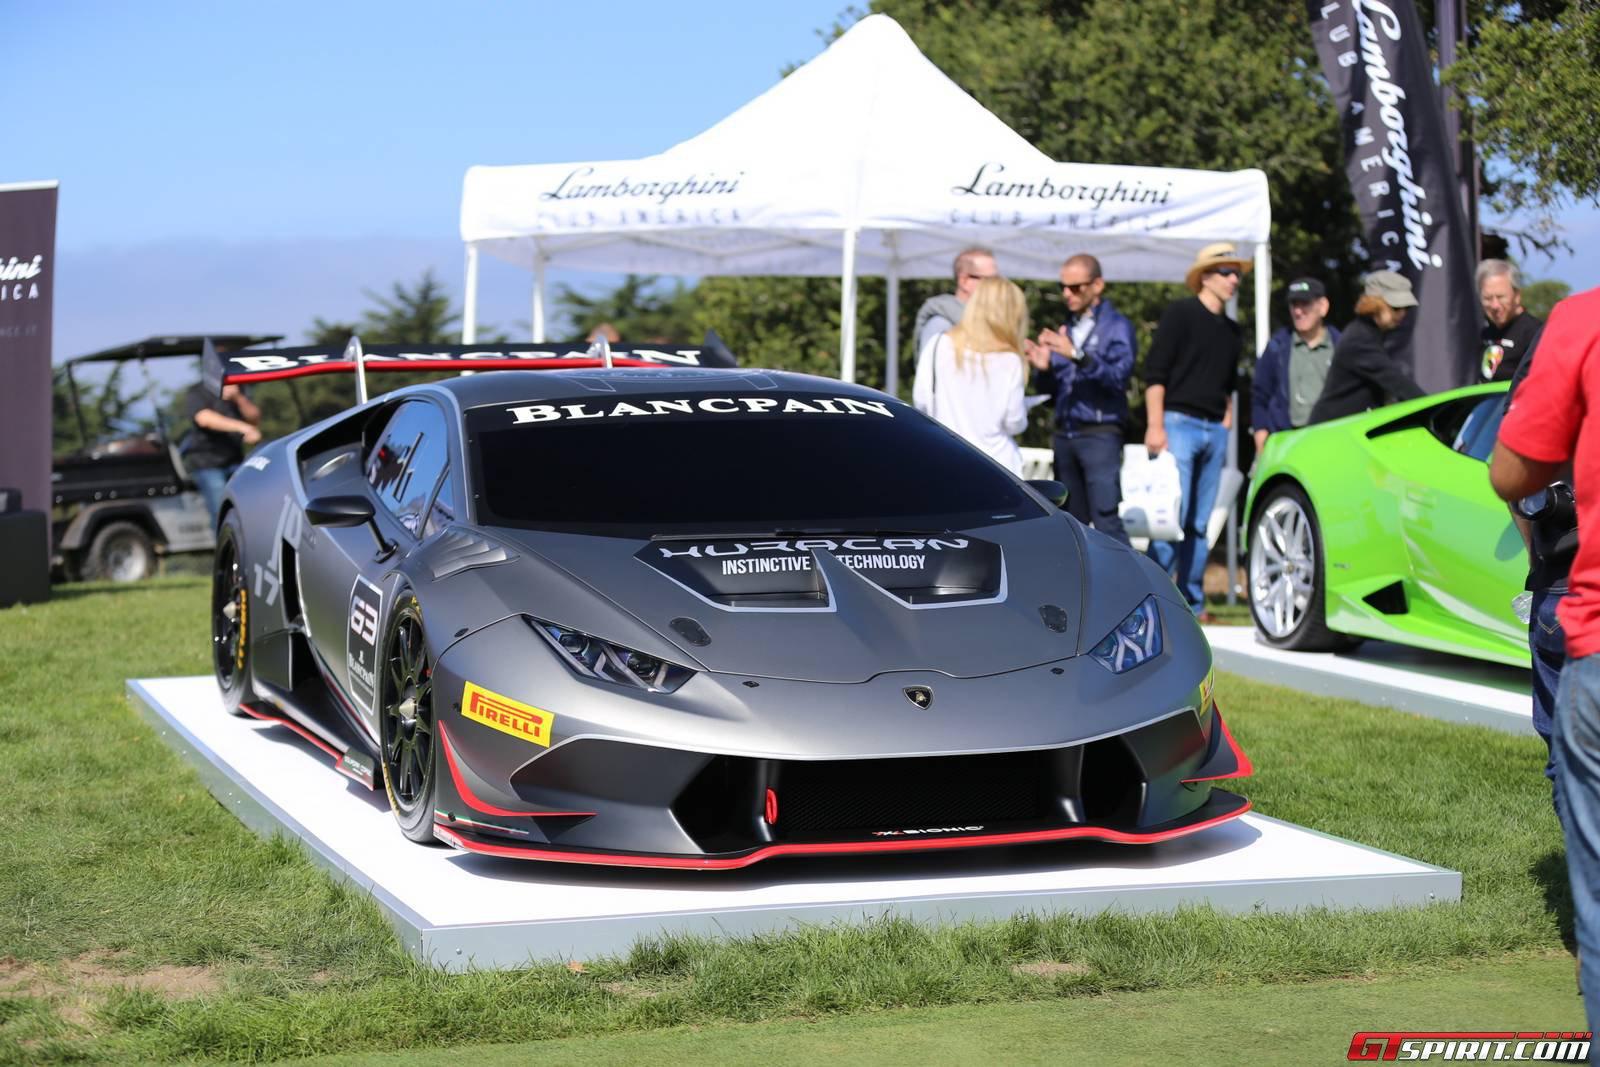 Monterey Concorso Italiano GTspirit - Monterey car show